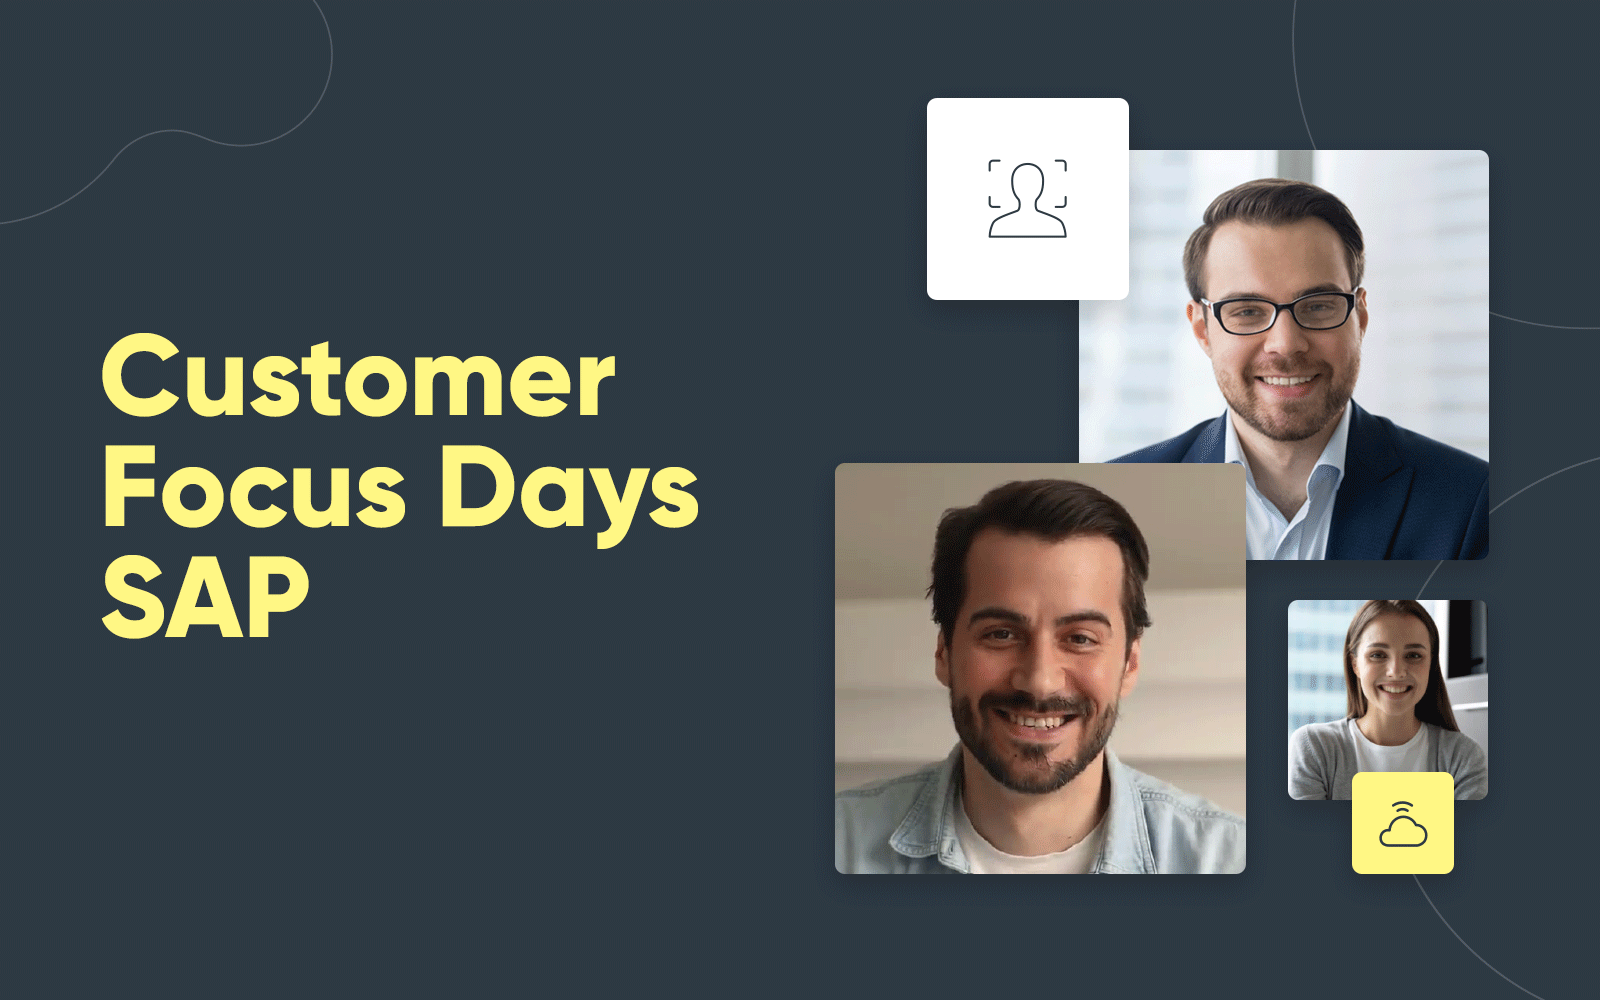 Grafik zu den valantic Customer Focus Days SAP am 5. und 6. Oktober 2021